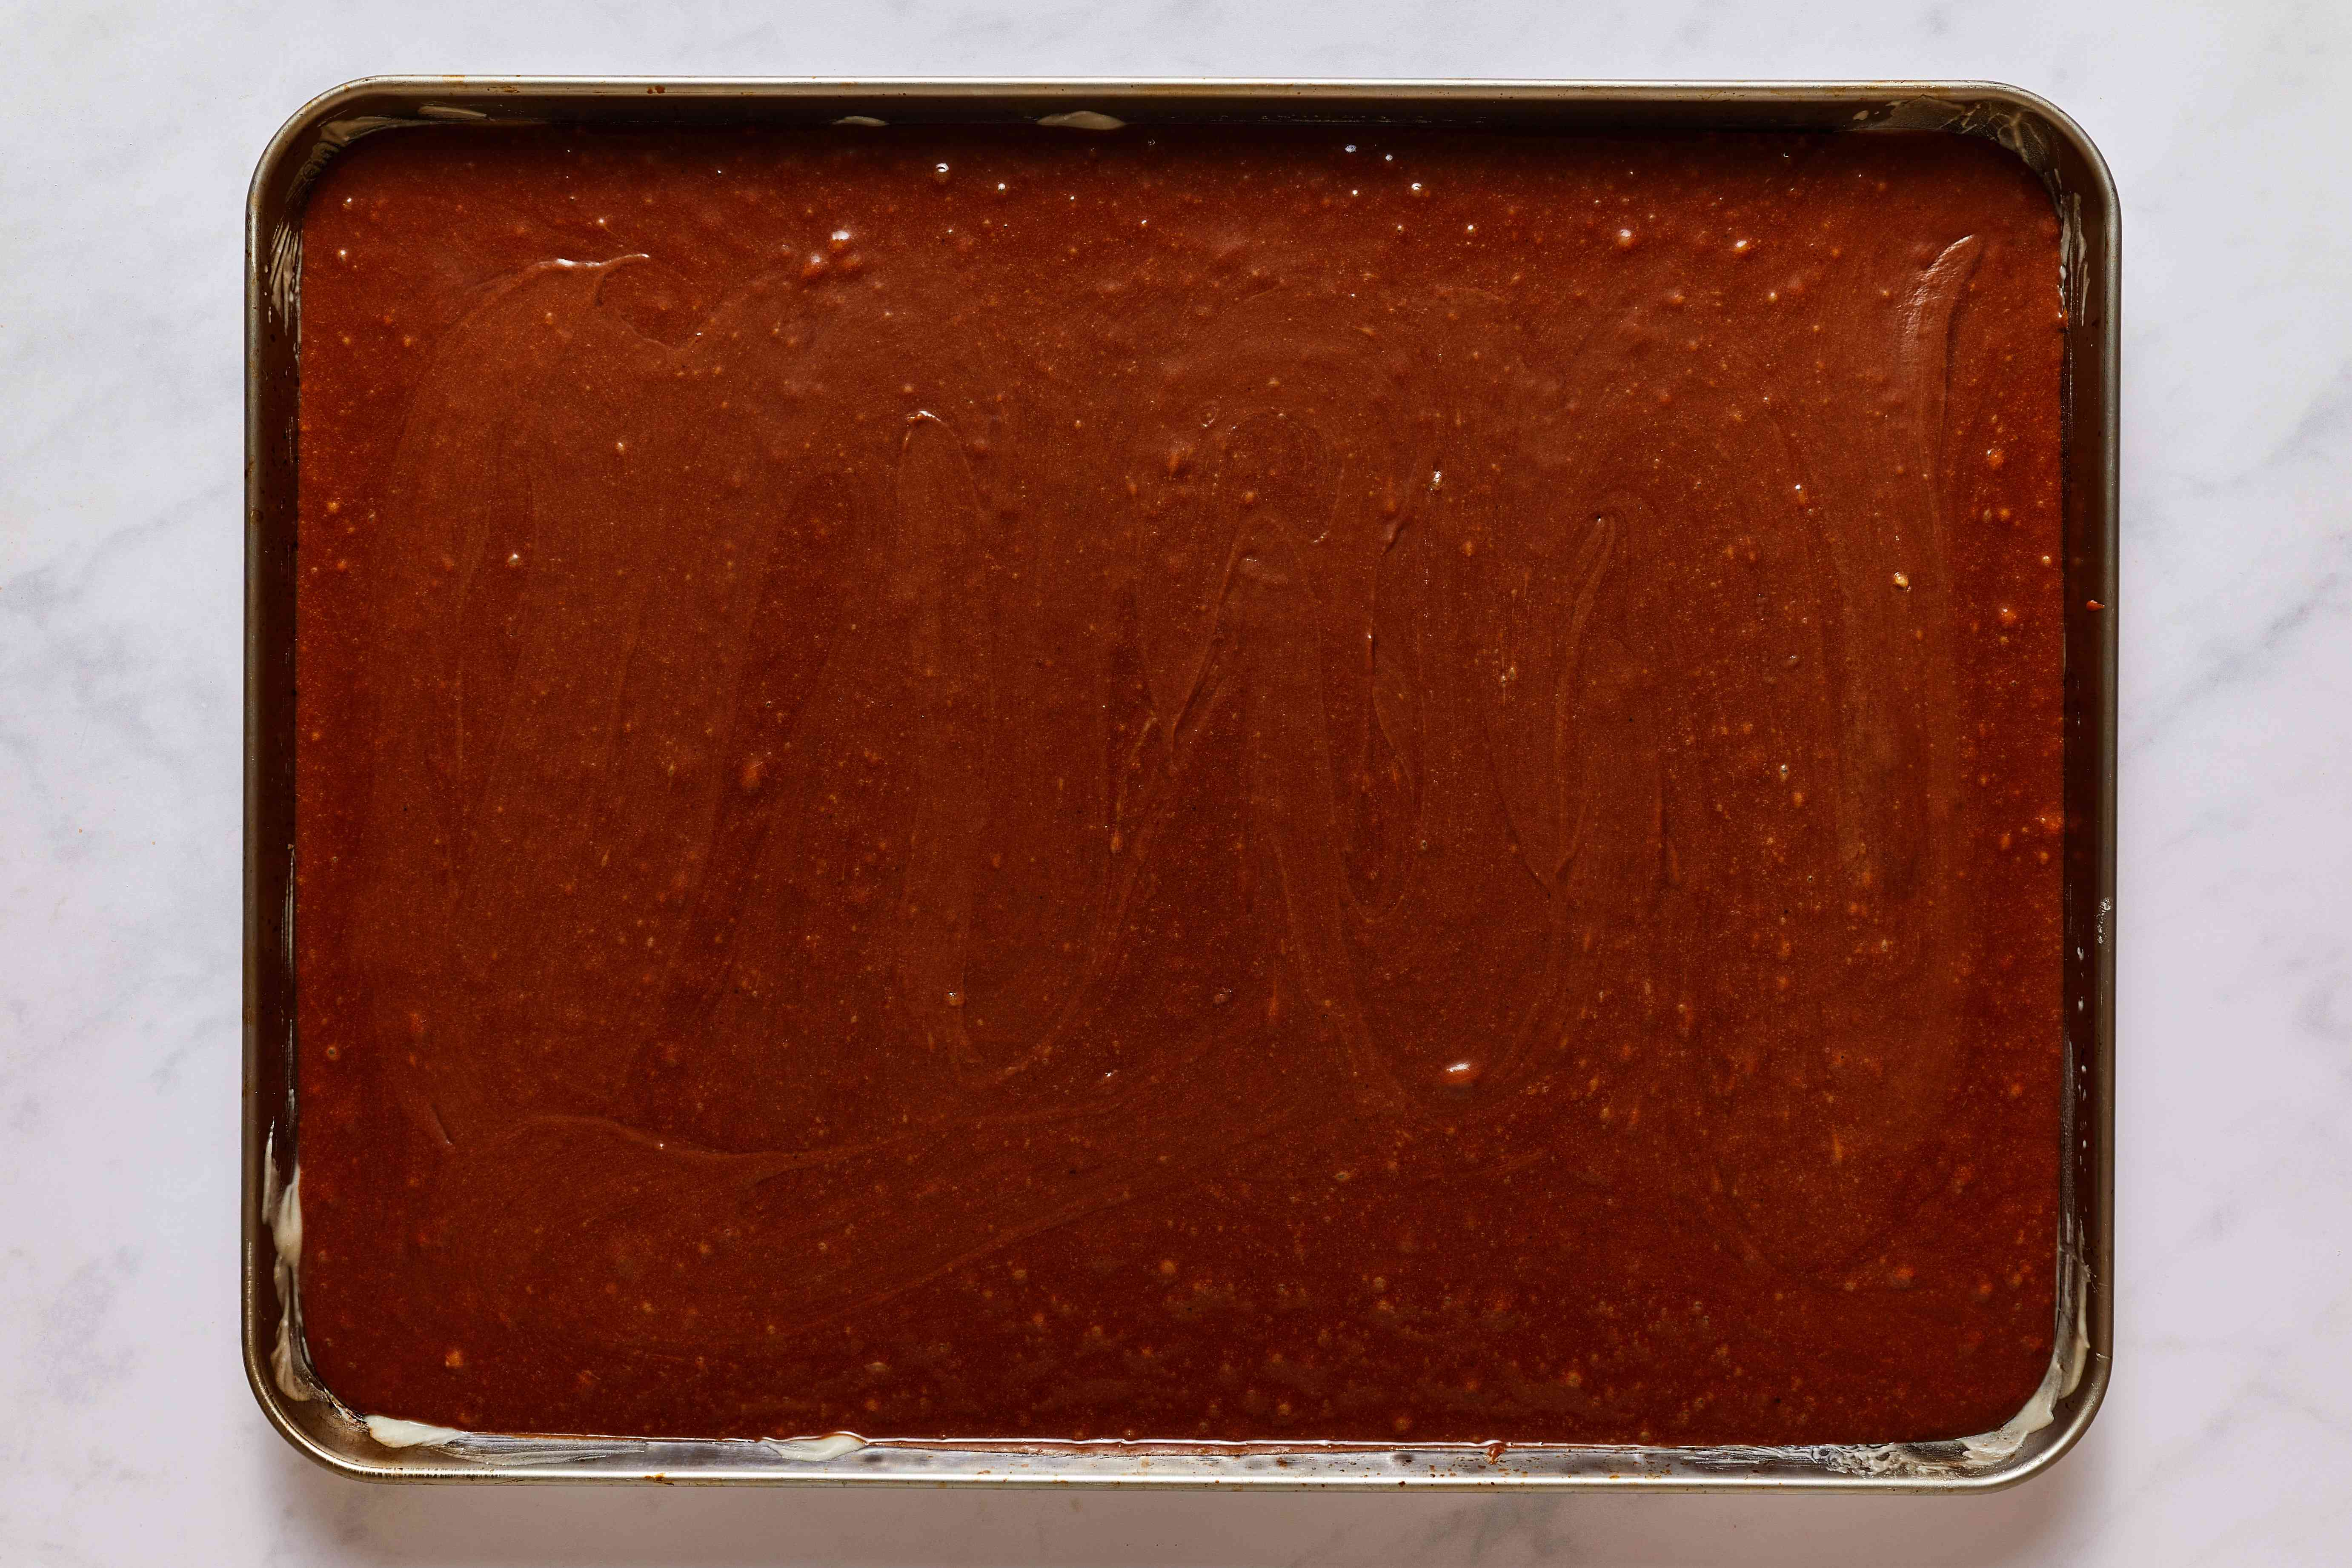 batter in a baking pan